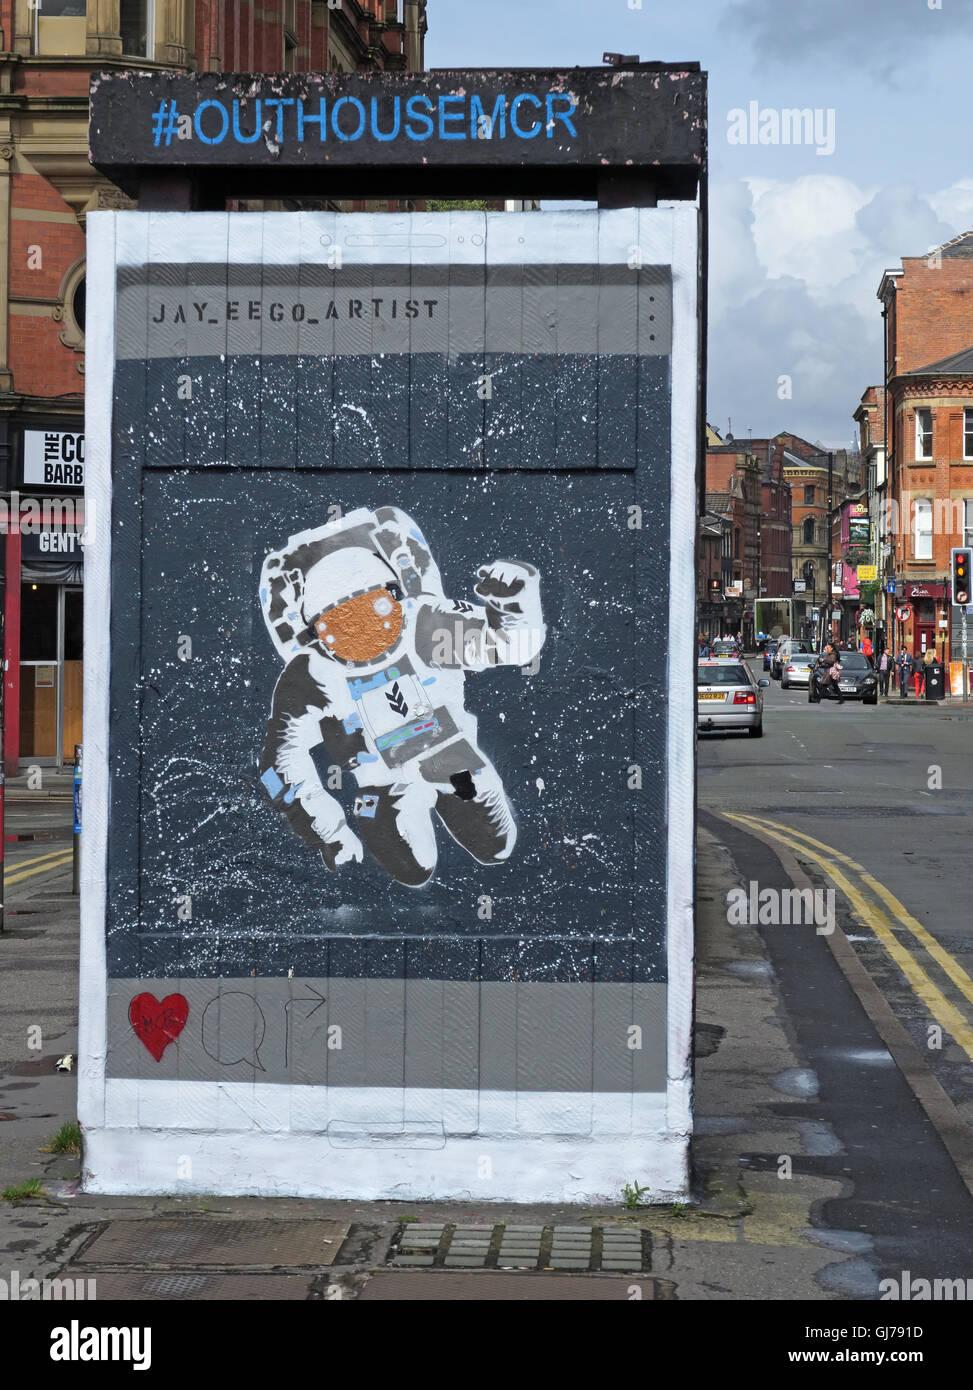 Laden Sie dieses Alamy Stockfoto Nördlichen Viertel Kunst in Stevenson Platz Manchester, UK - Wand Graffiti August2016 OUTHOUSEMCR - GJ791D